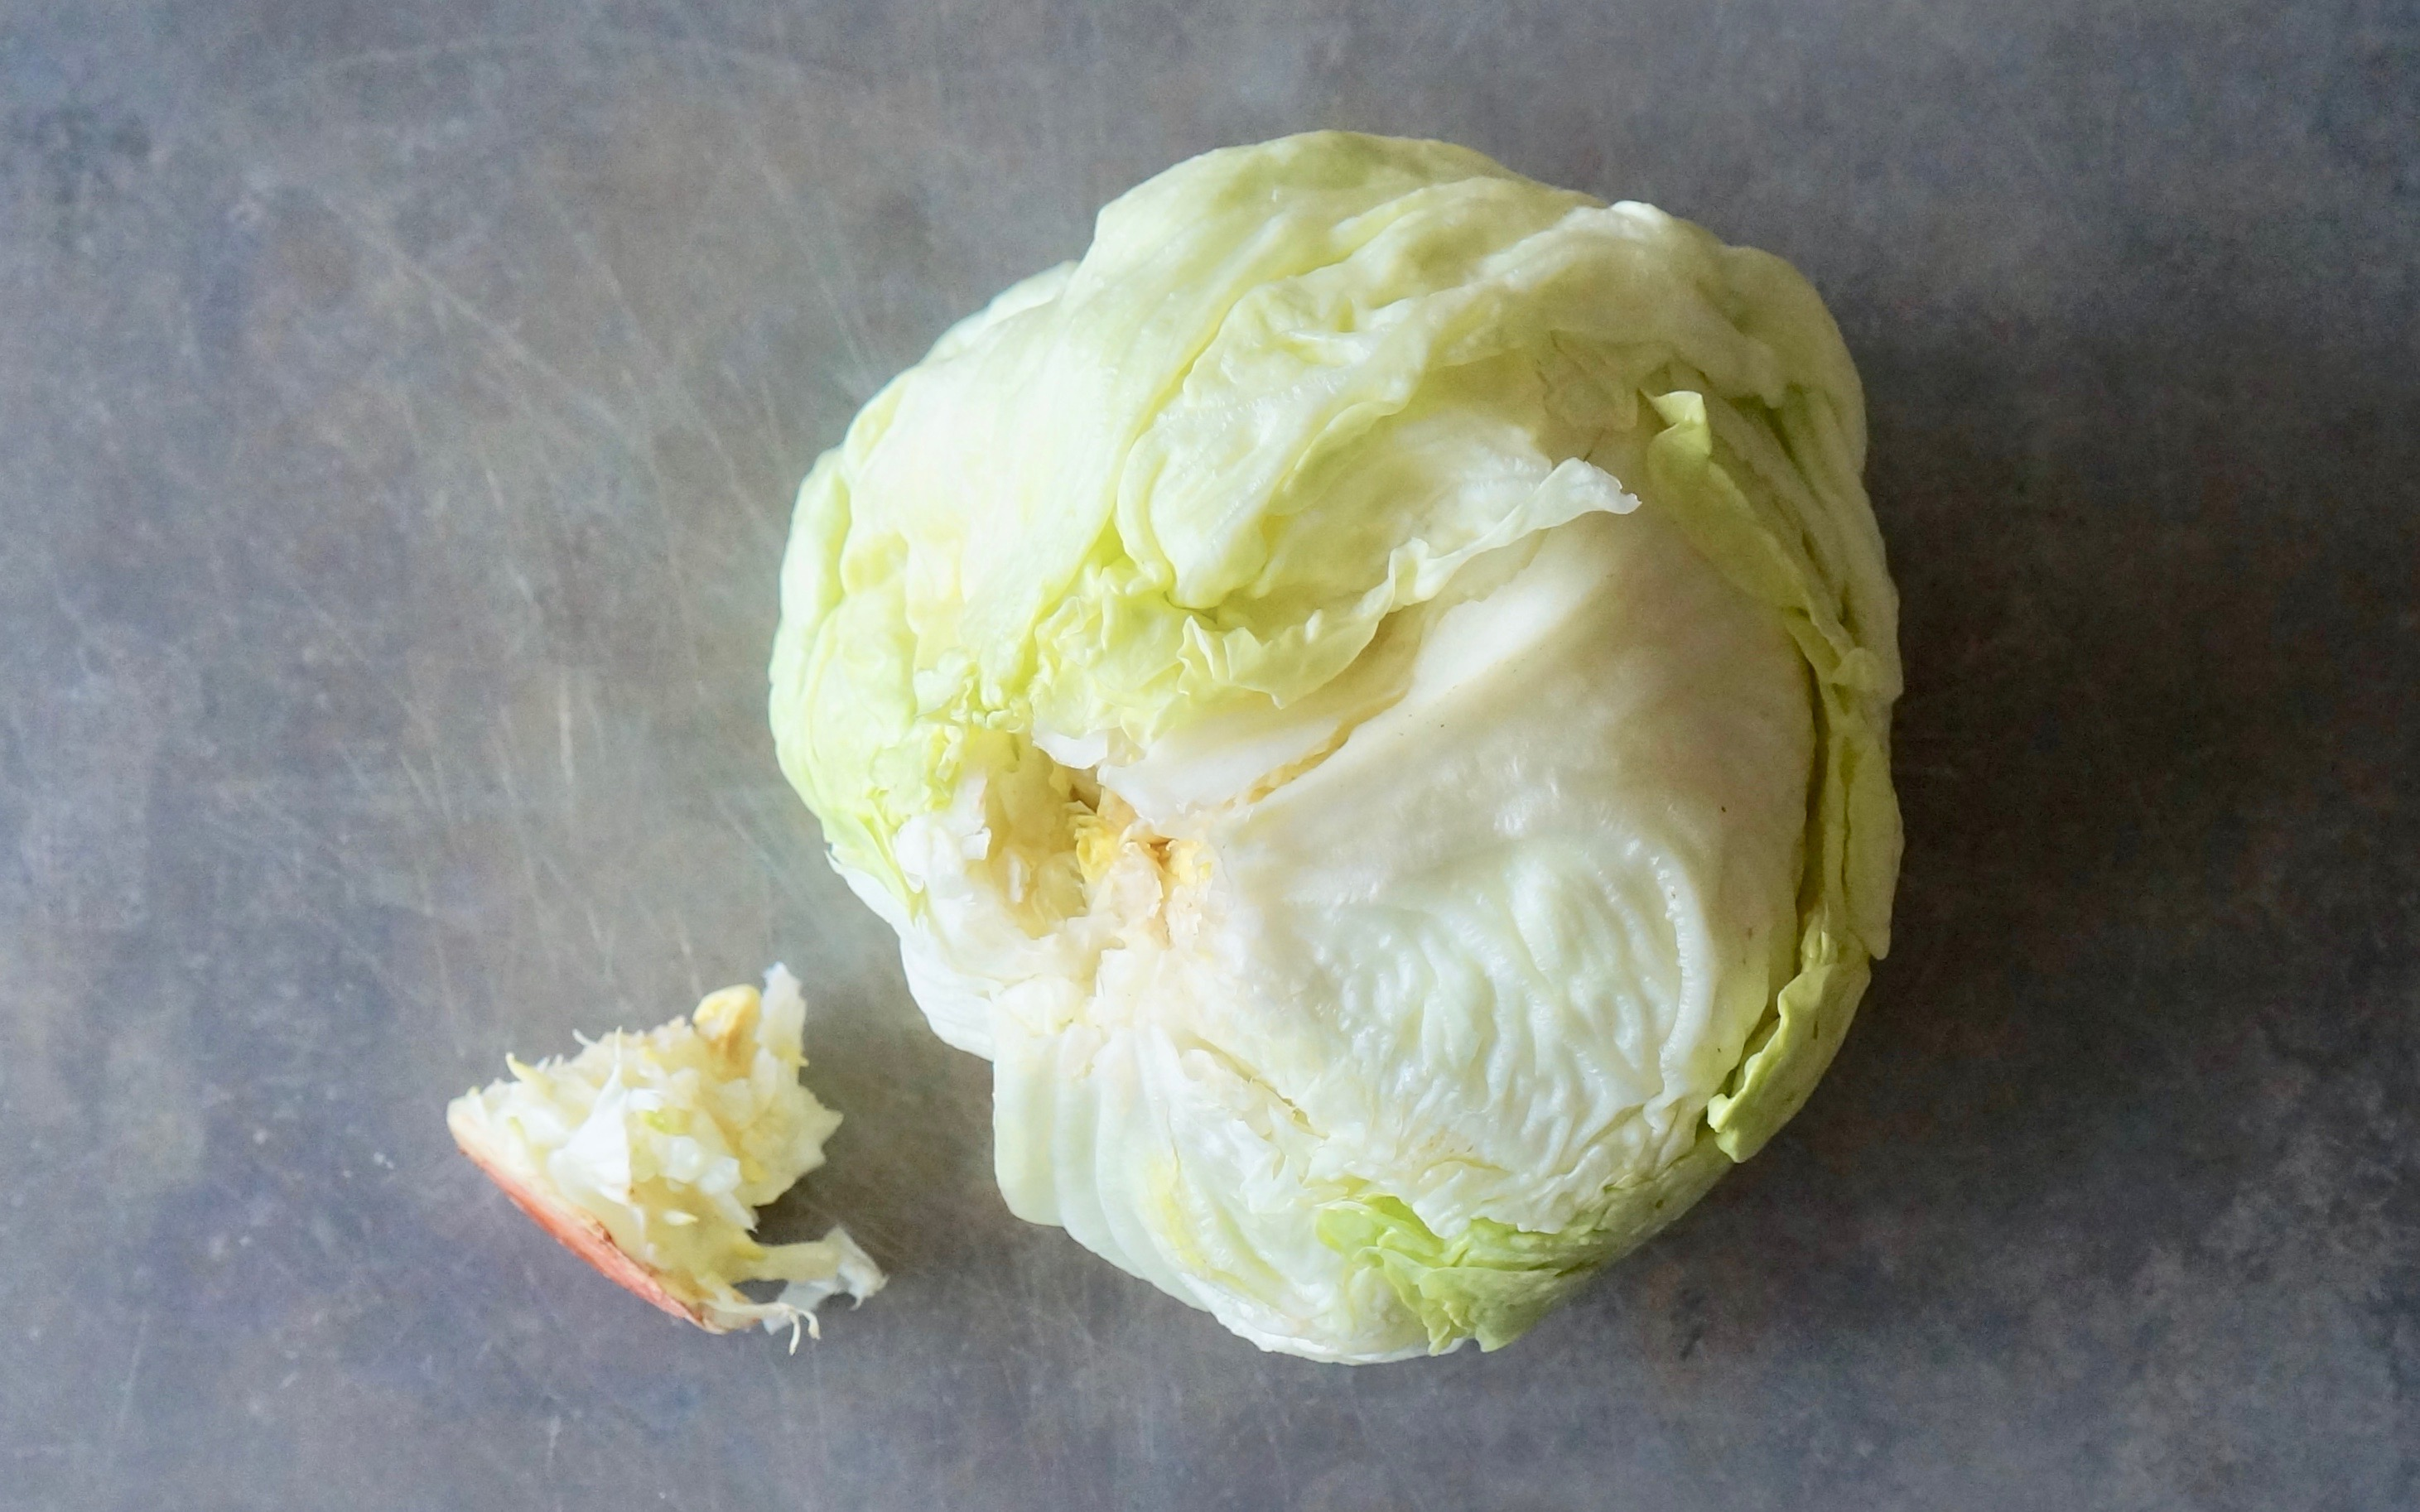 How-To-Clean-Core-Iceburg-Lettuce-Rebecca-Gordon-Publisher-Buttermilk-Lipstick-Culinary-Entertaining-Techniques-RebeccaGordon-Southern-Hostess-Birmingham-Alabama